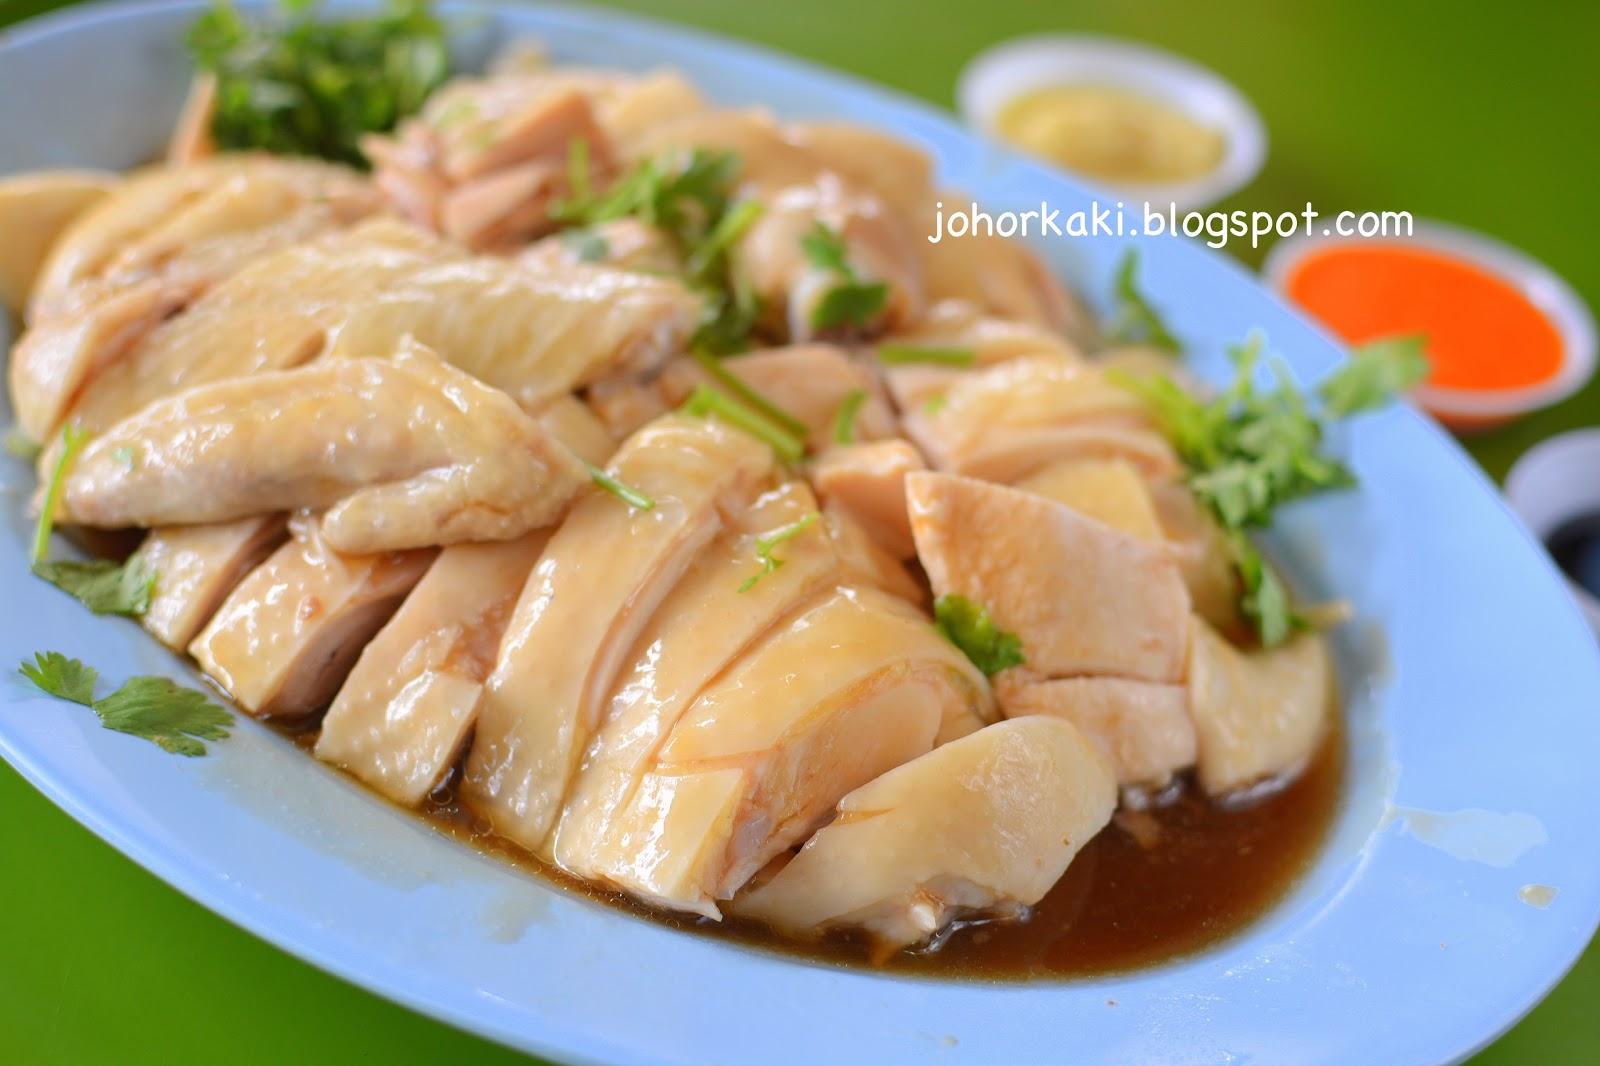 Ah Tai Hainanese Chicken Rice Maxwell Food Centre ...